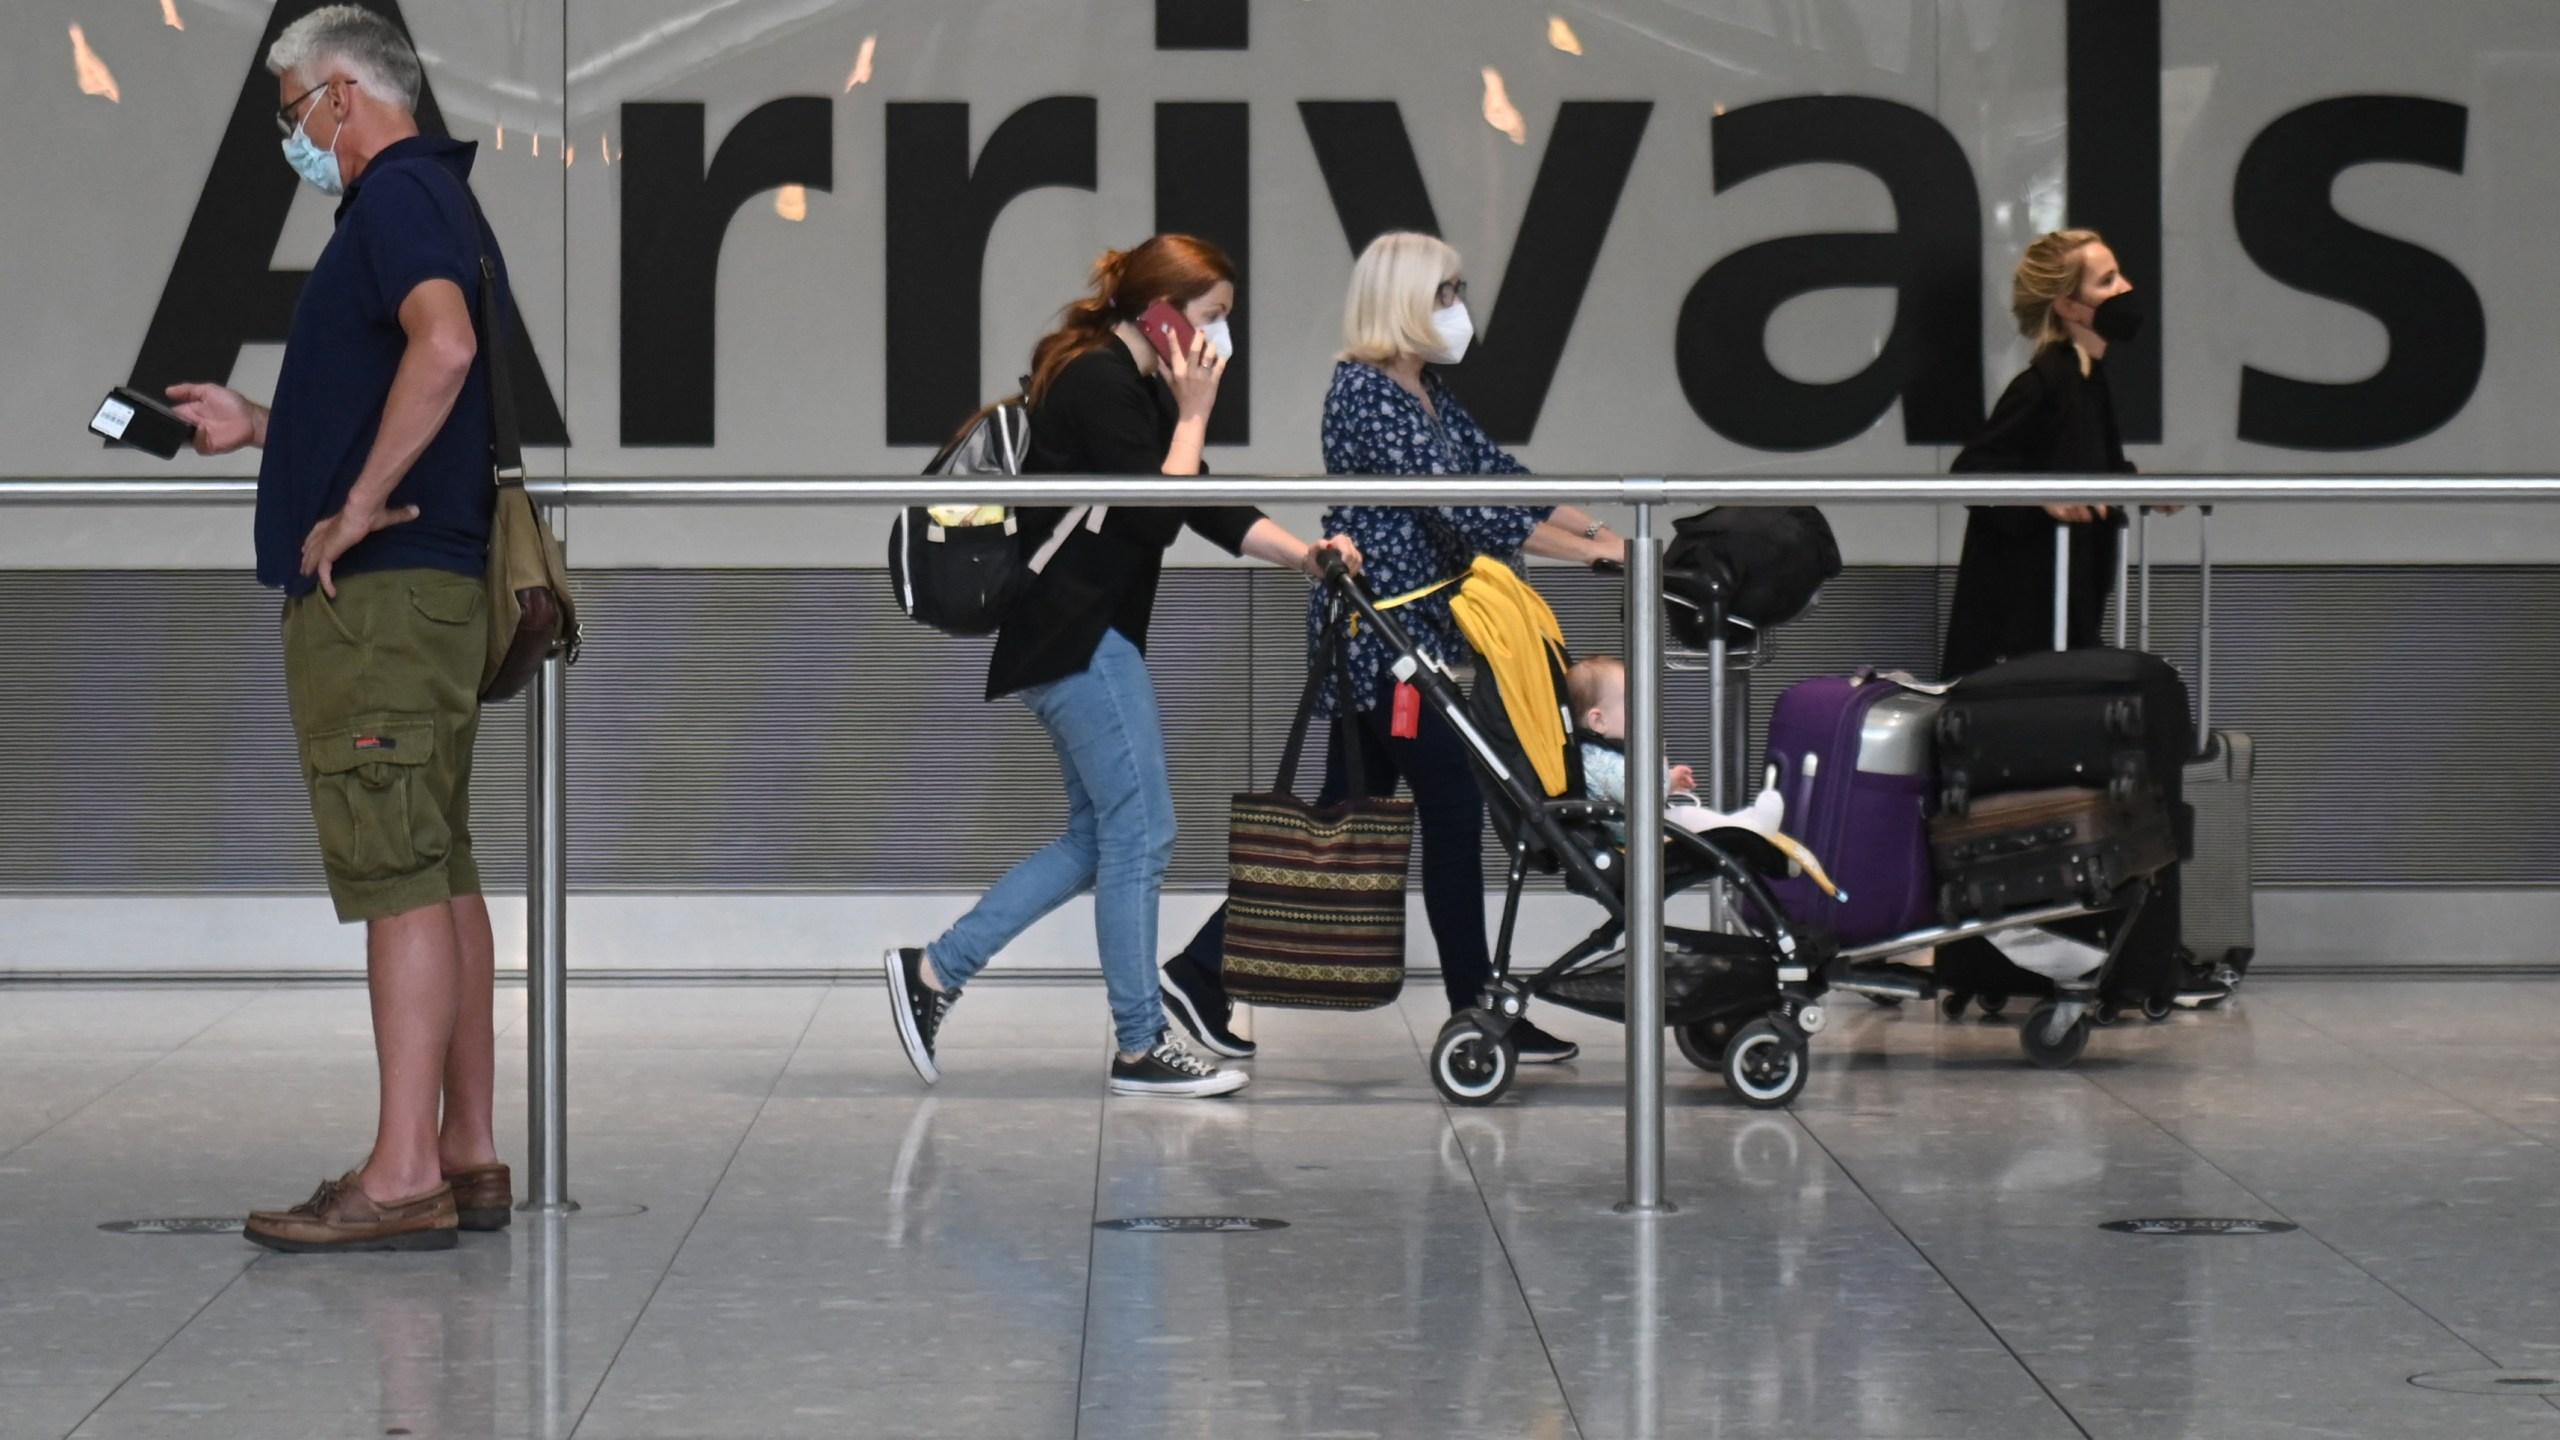 Travelers walk through Heathrow airport in London, on June 3, 2021. (DANIEL LEAL-OLIVAS/AFP via Getty Images)